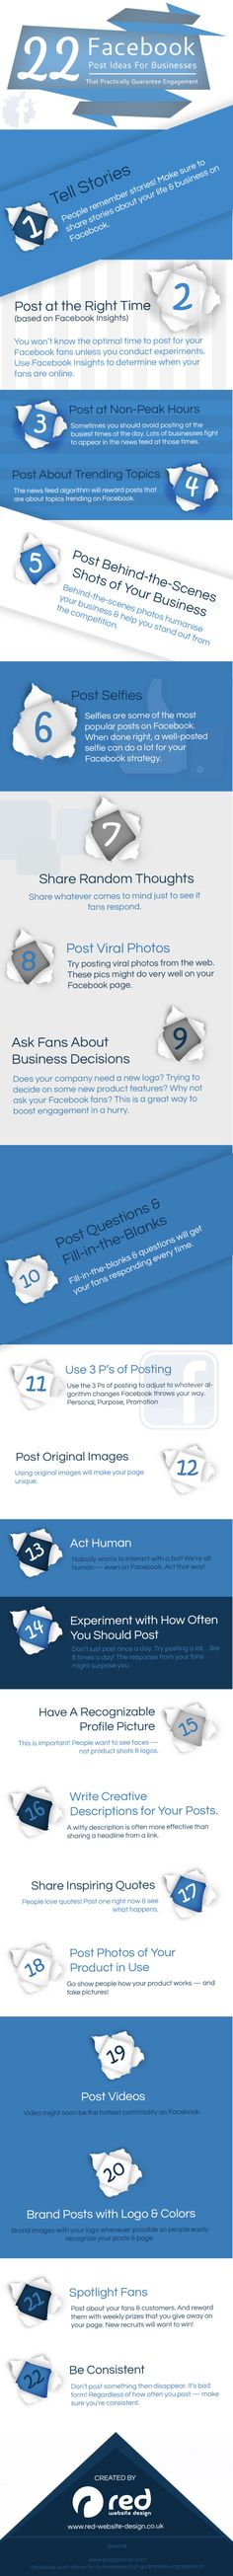 22 Facebook post ideas for businesses #infographic #socialmedia